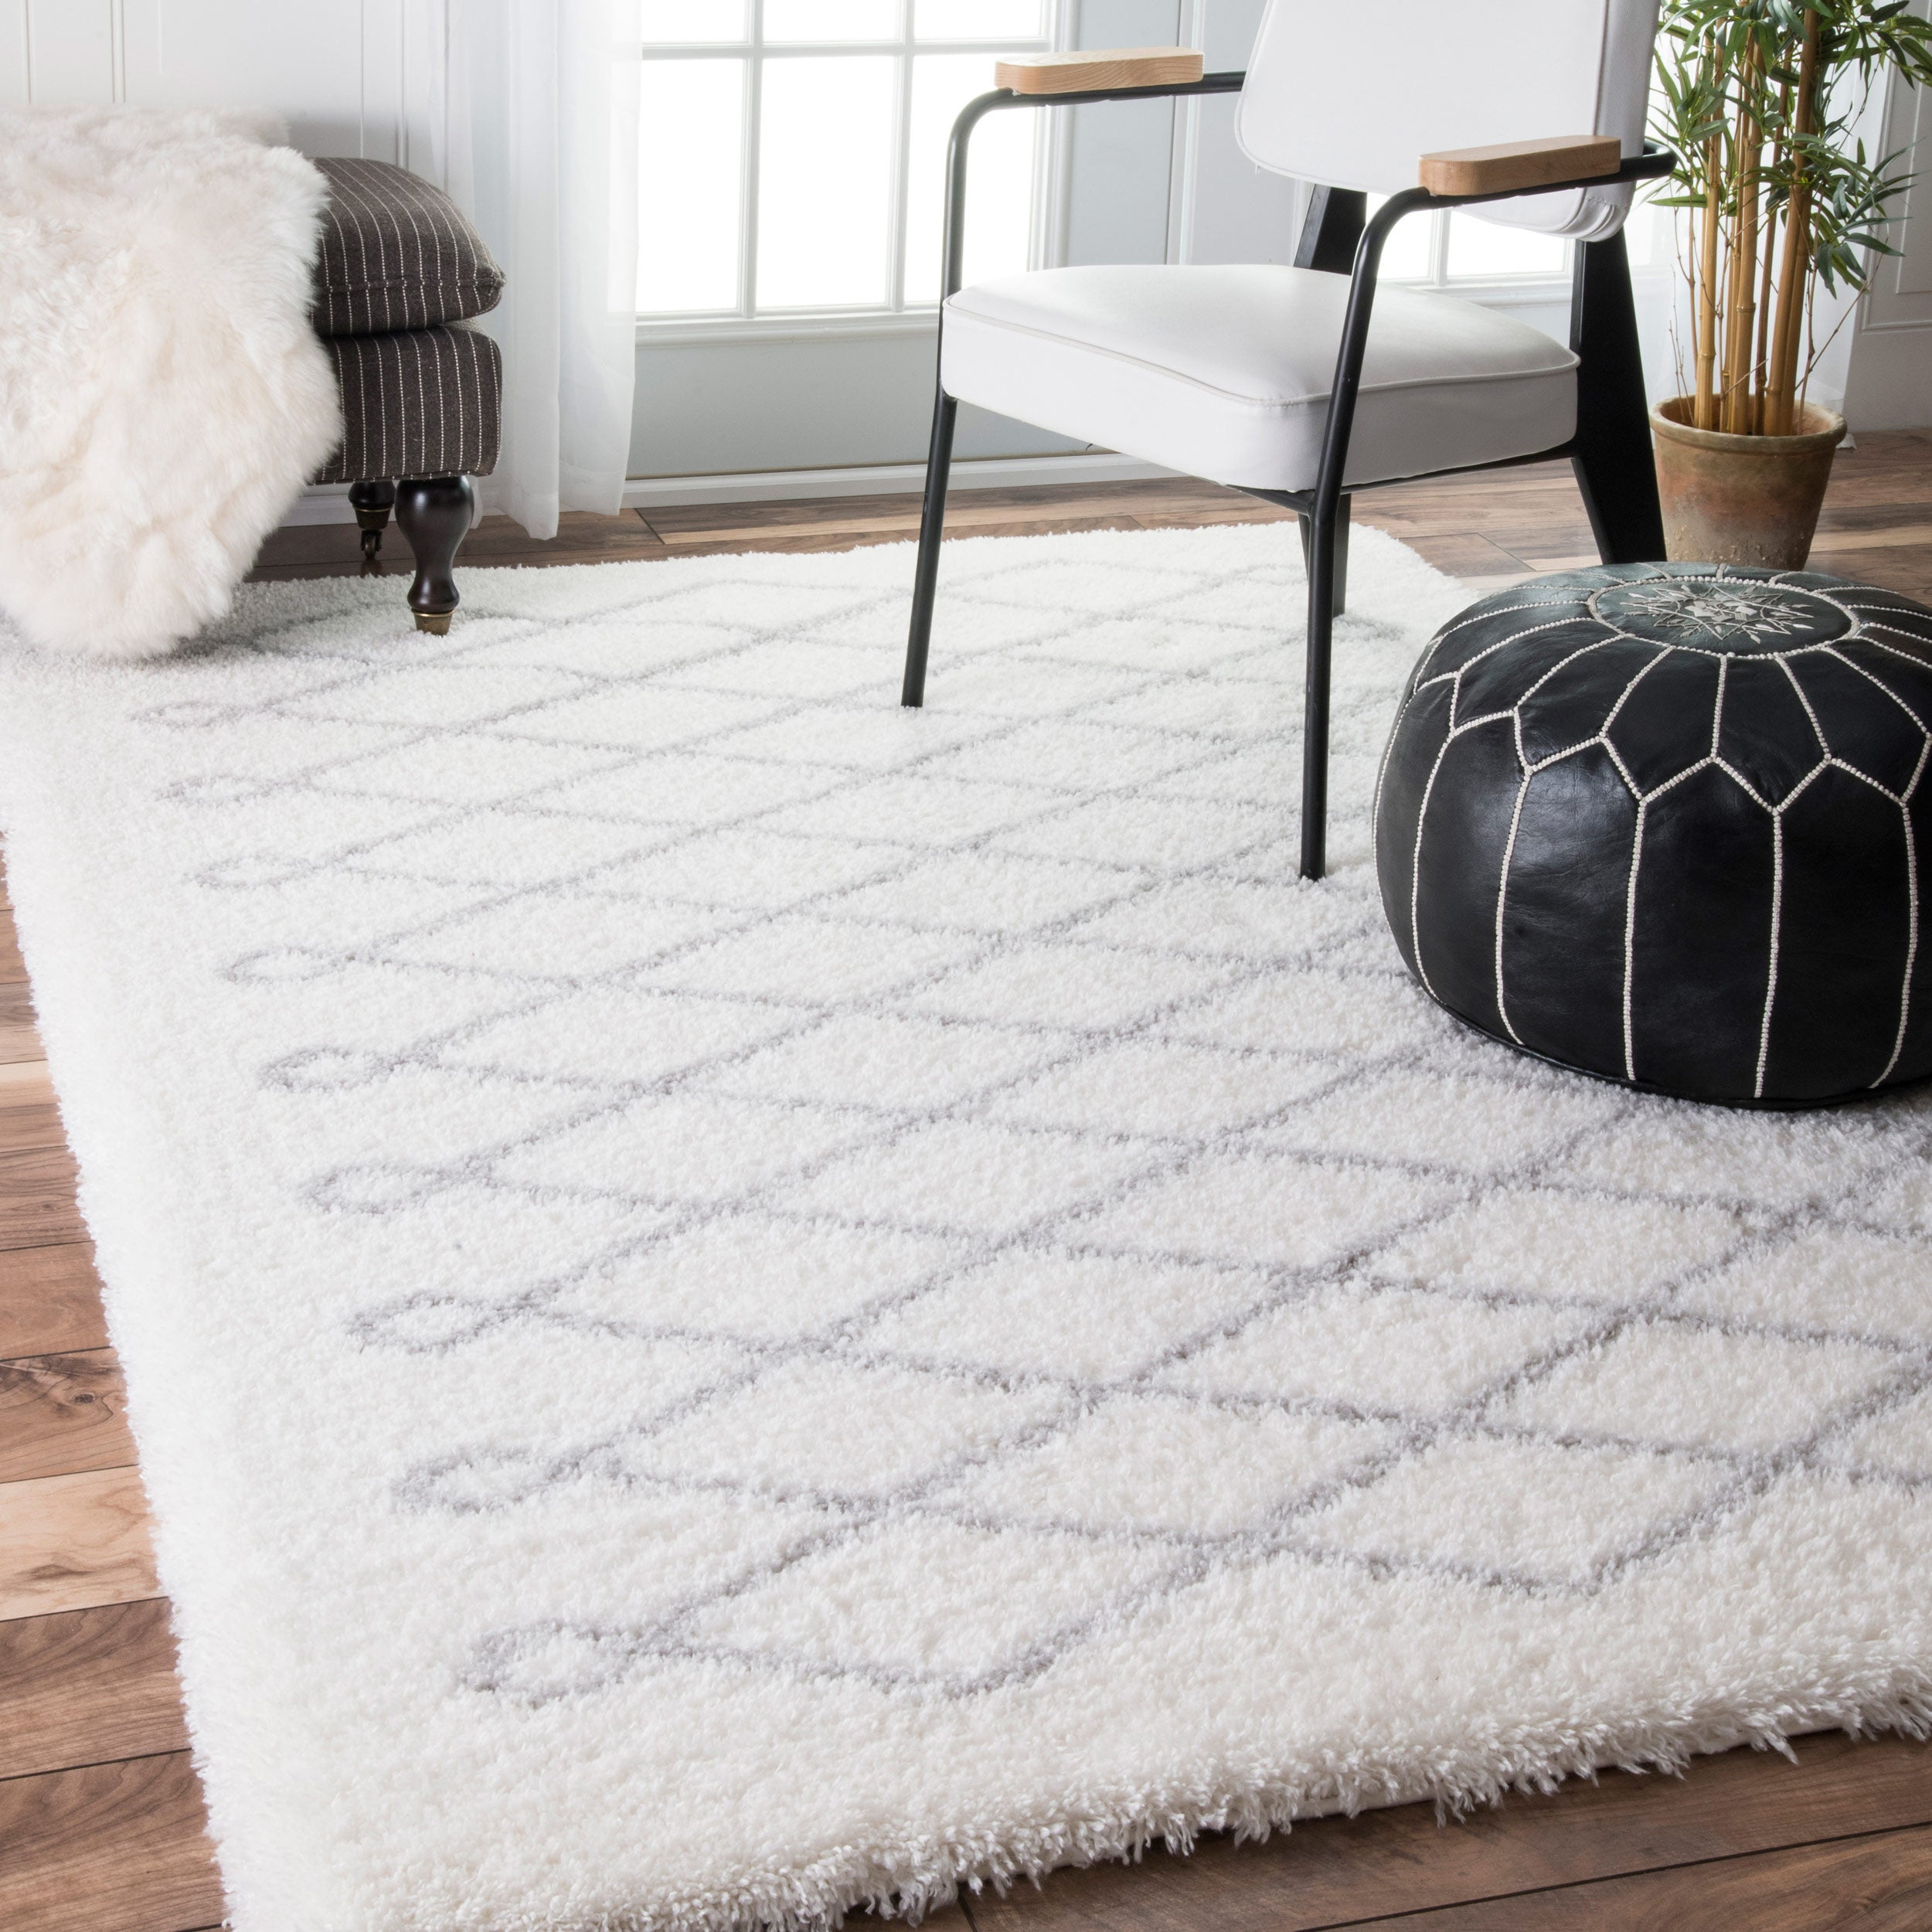 Shop nuLOOM Soft and Plush Cloudy Shag Diamond White Rug (5\'3 x 7\'6 ...